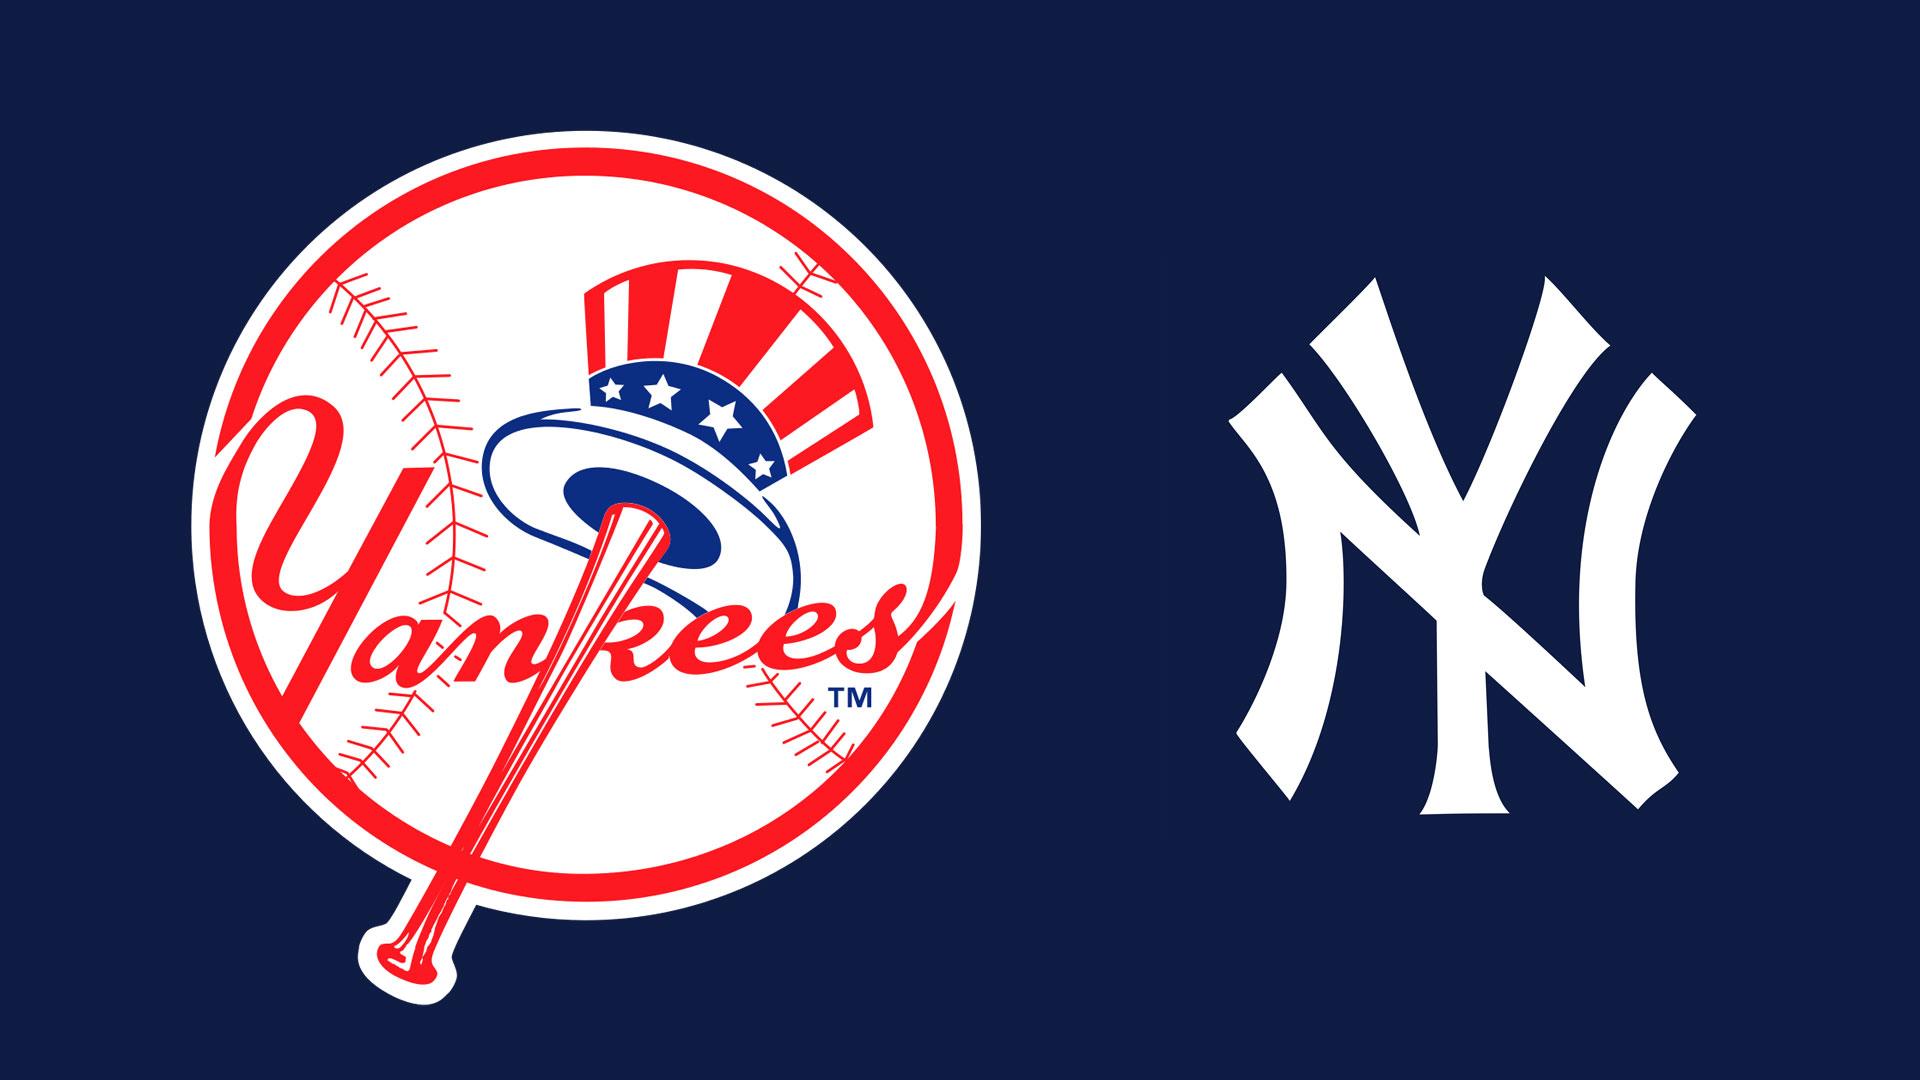 67 Ny Yankees Logo Wallpaper On Wallpapersafari